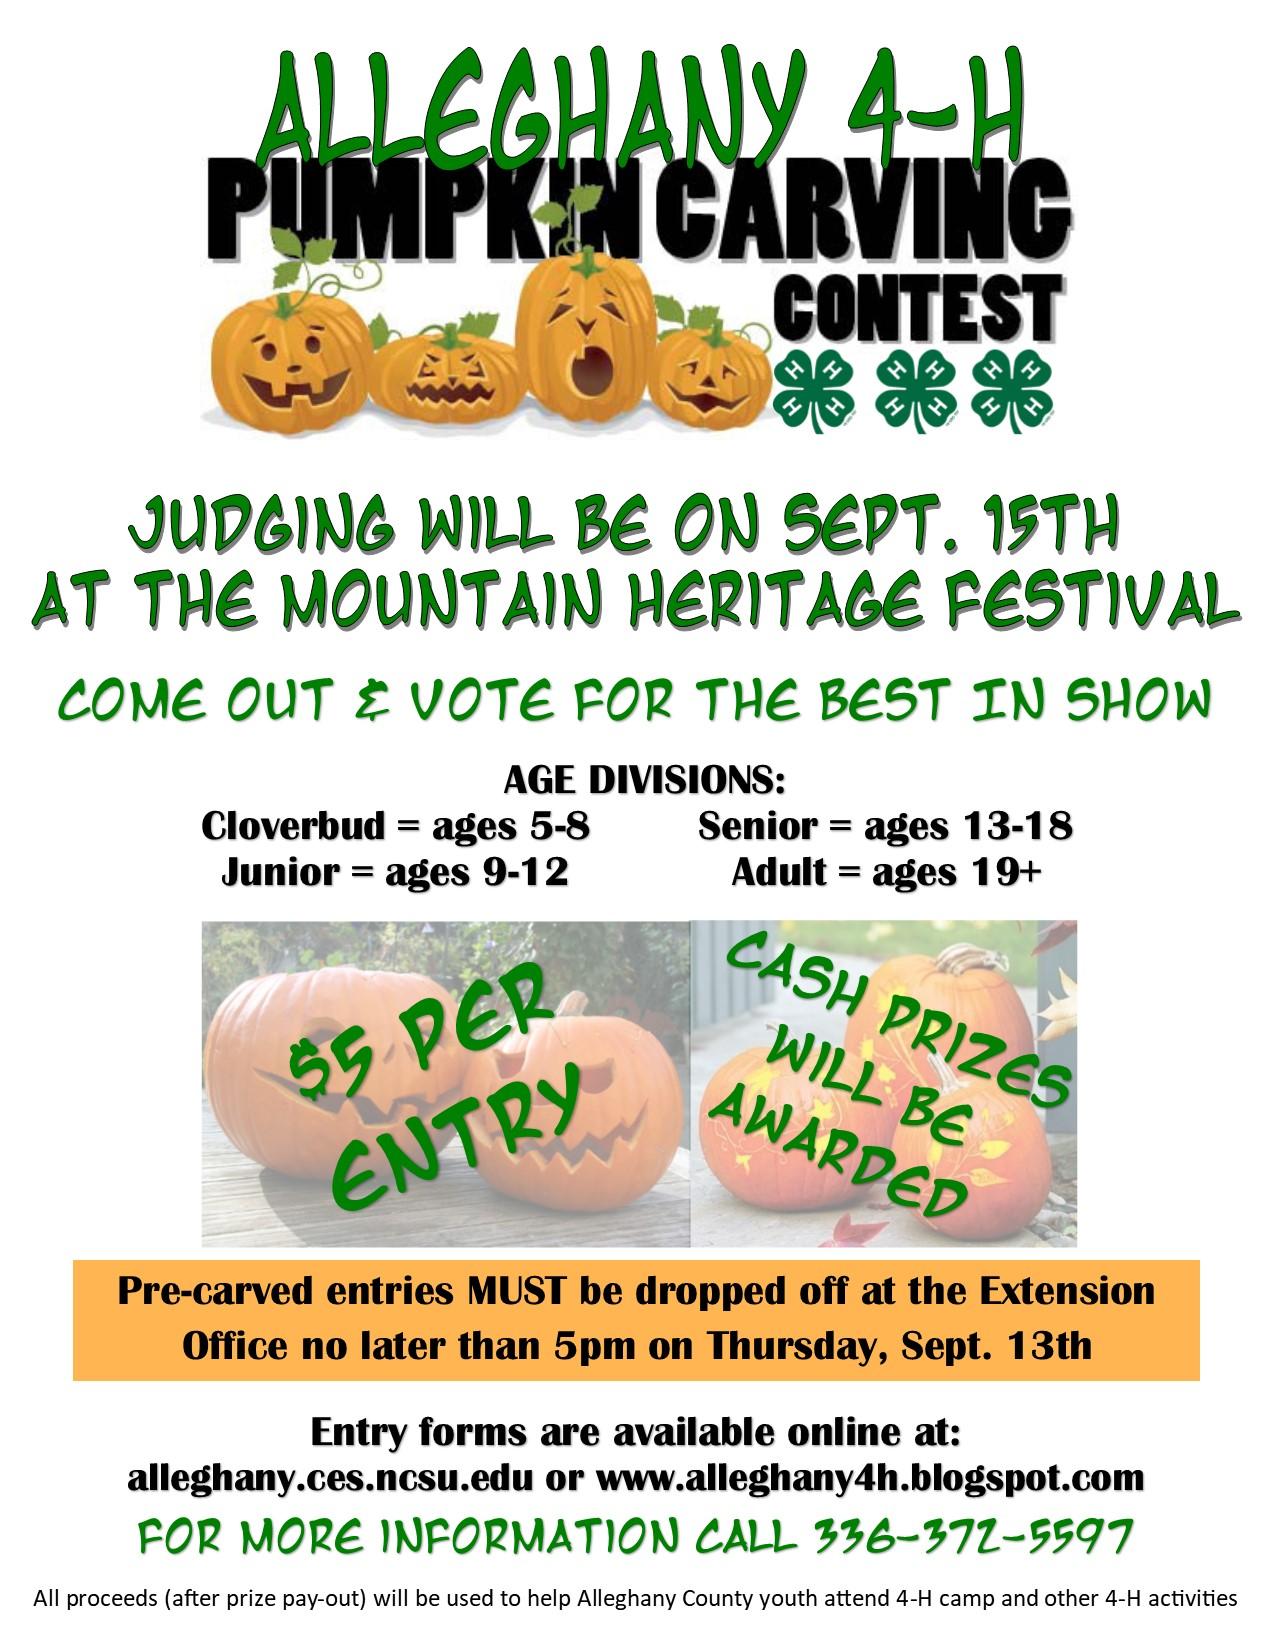 Pumpkin Carving Contest flyer image